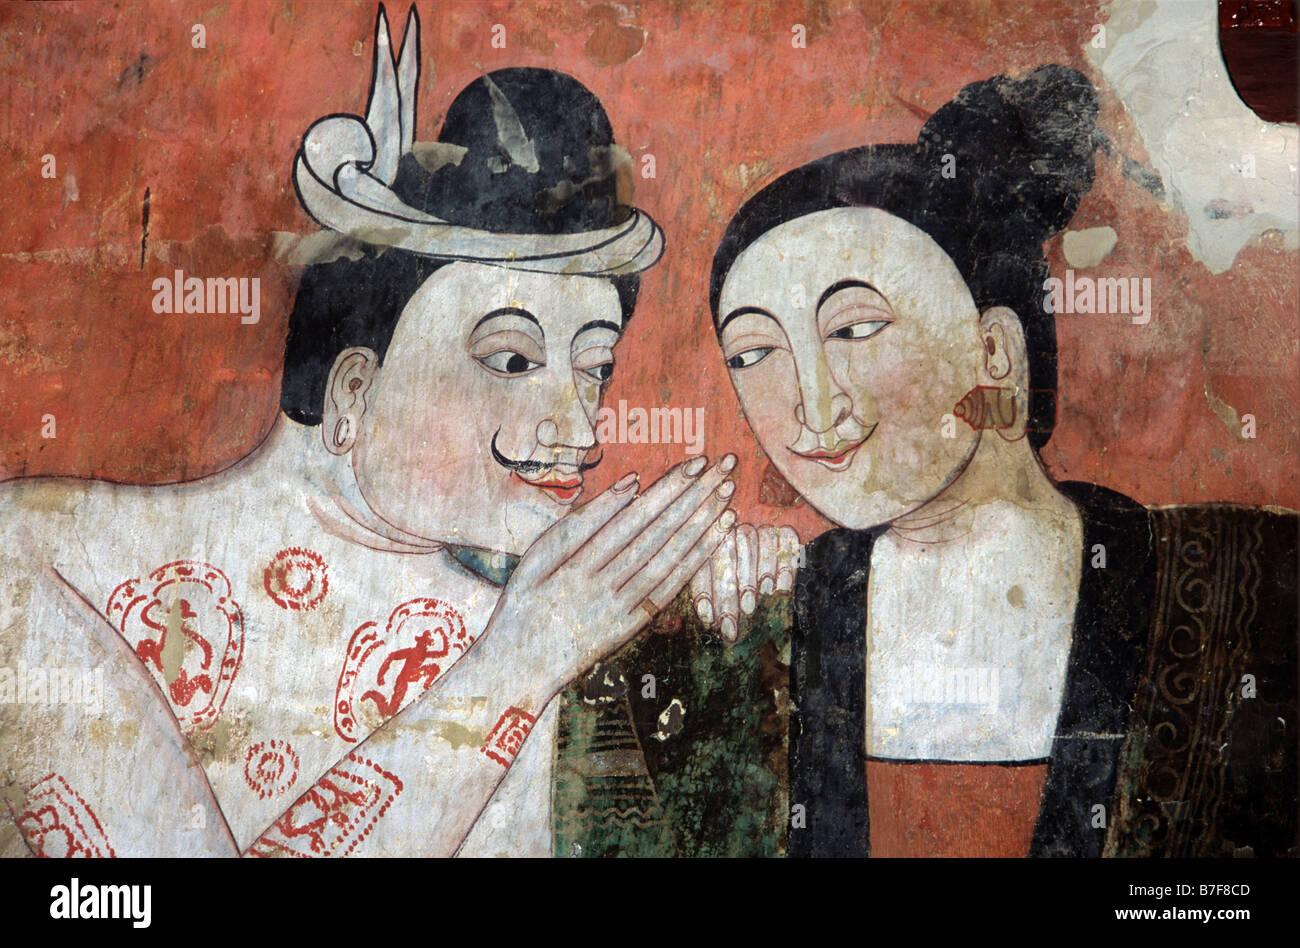 Thai-Liebhaber Verführung, c19th Wandbild oder Wandbild von Thit Buaphan, Wat Phumin Tempel, Nan, Nord-Thailand Stockfoto